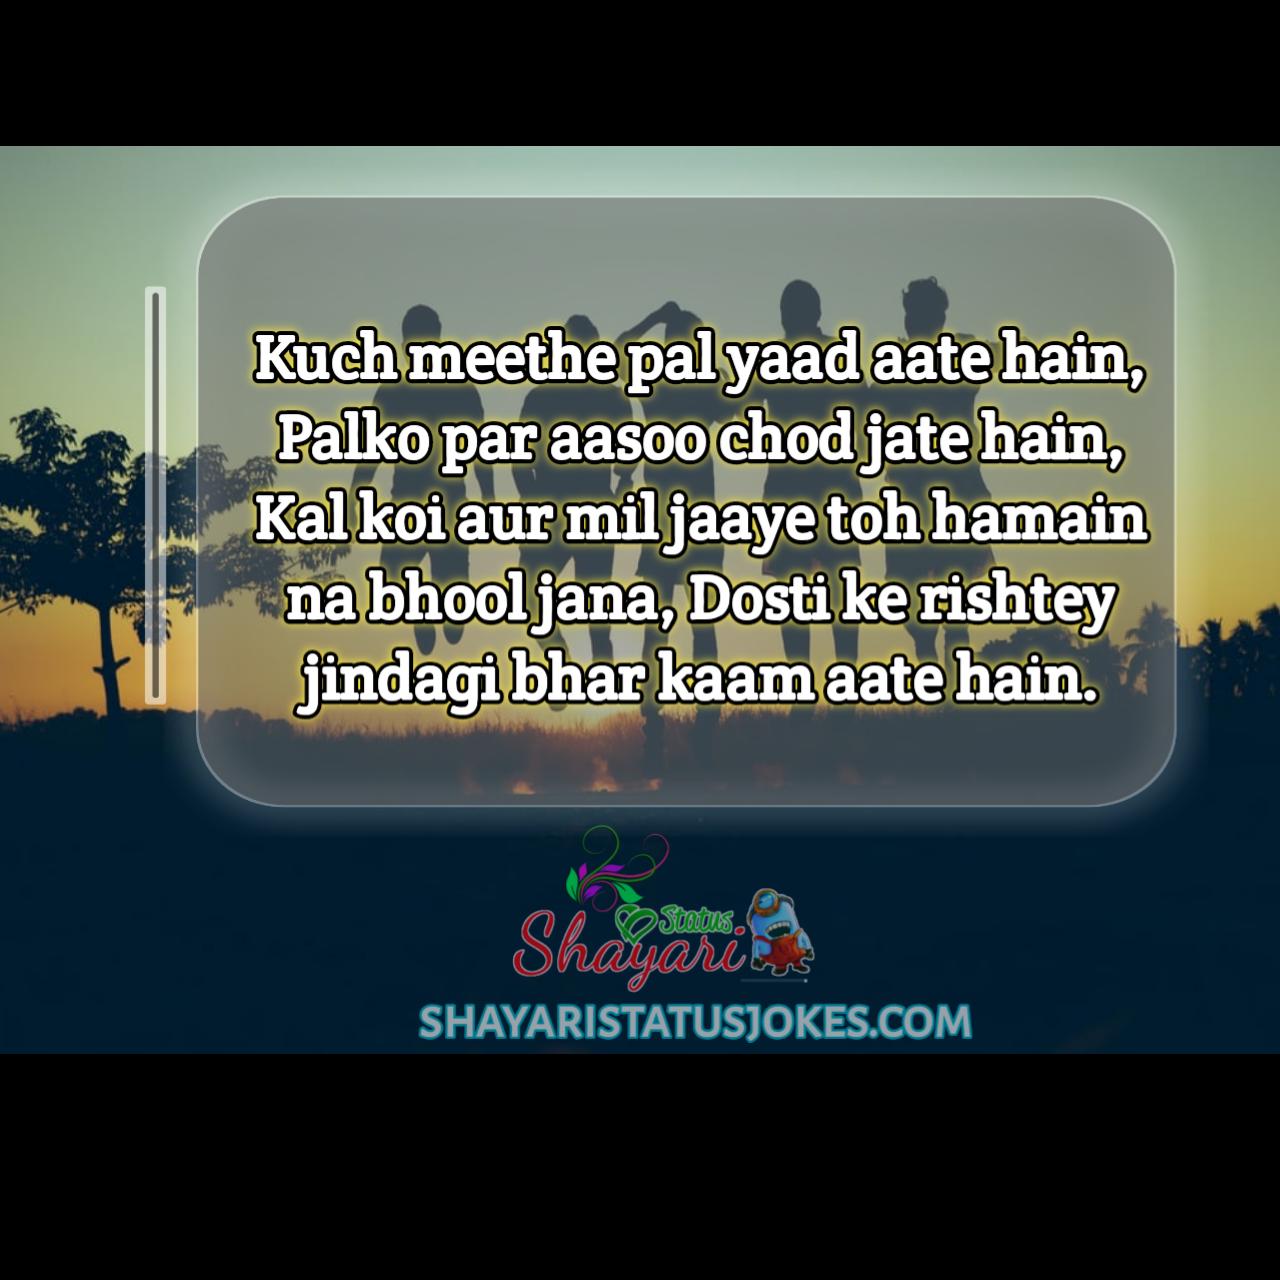 Friendship Day Shayari 2021,Happy Friendship Day Shayari 2021 In Hindi, फ्रेंडशिप डे शायरी, Friendship Day Shayari In Hindi, happy friendship day Shayari, friendship day quotes in Hindi, friendship day Shayari images.